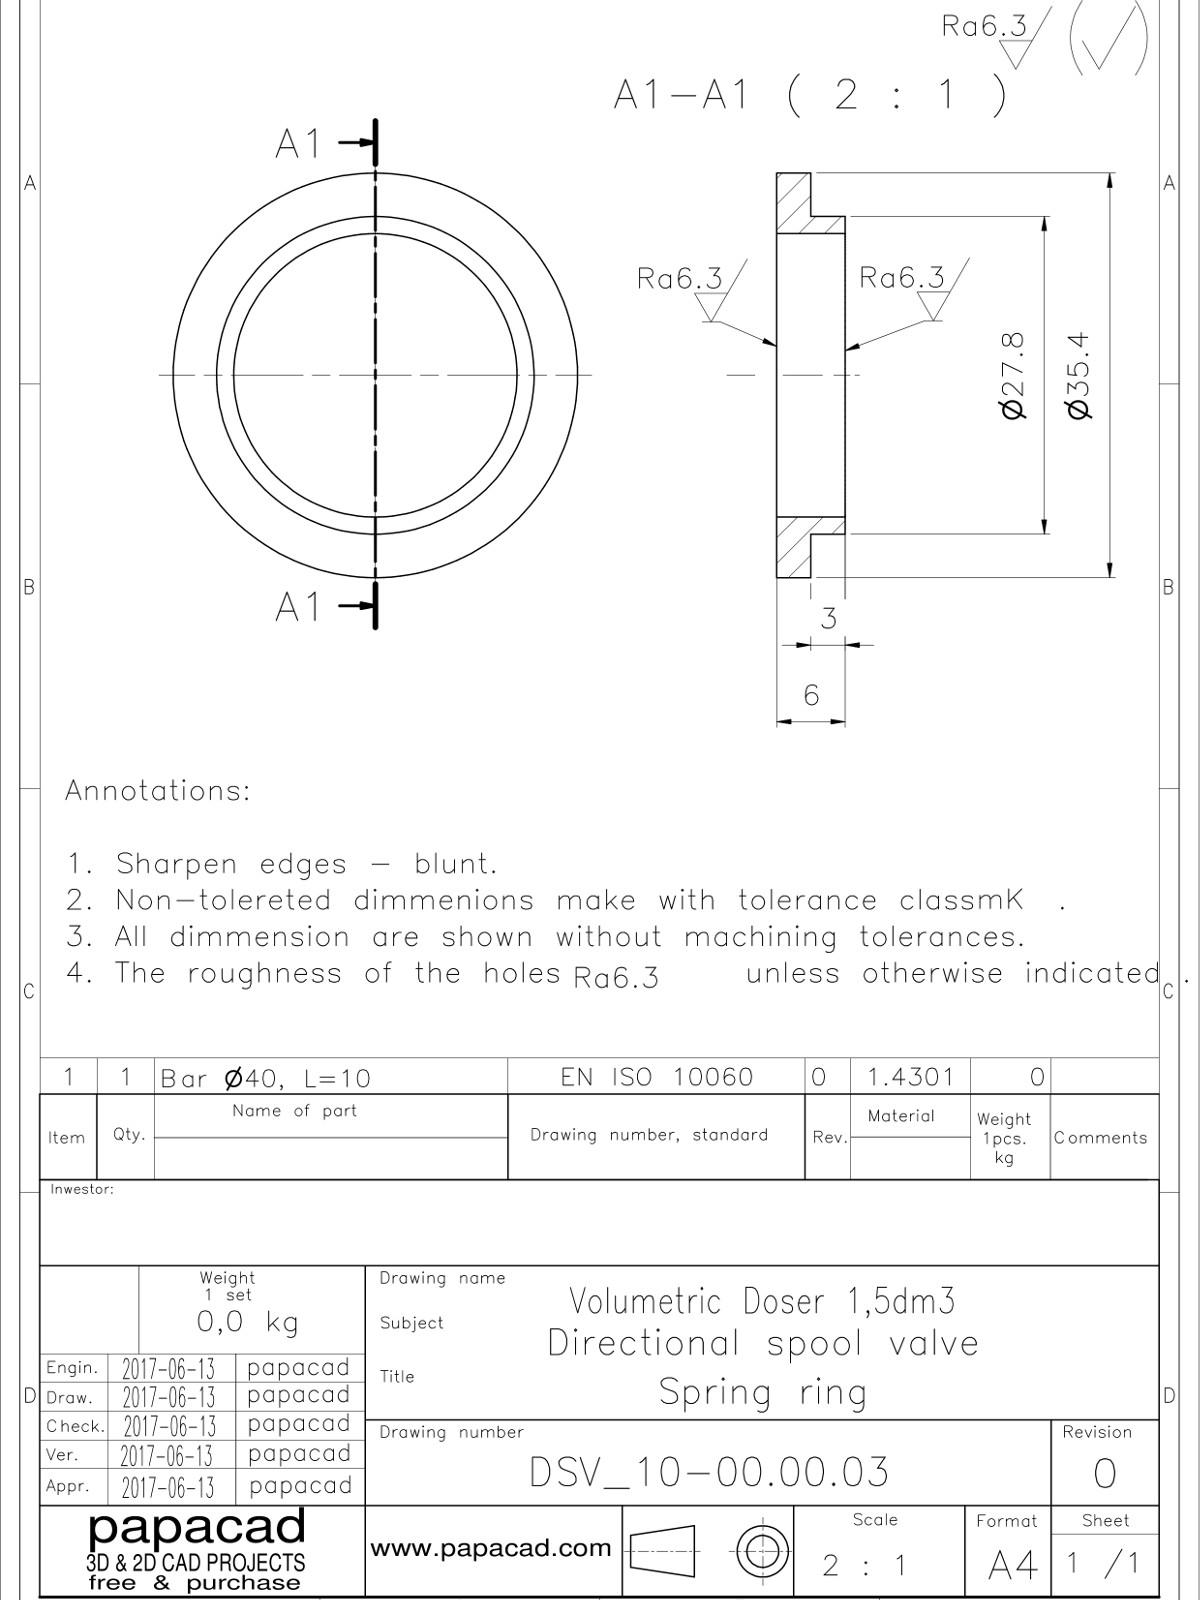 Valve 2D DWG drawings